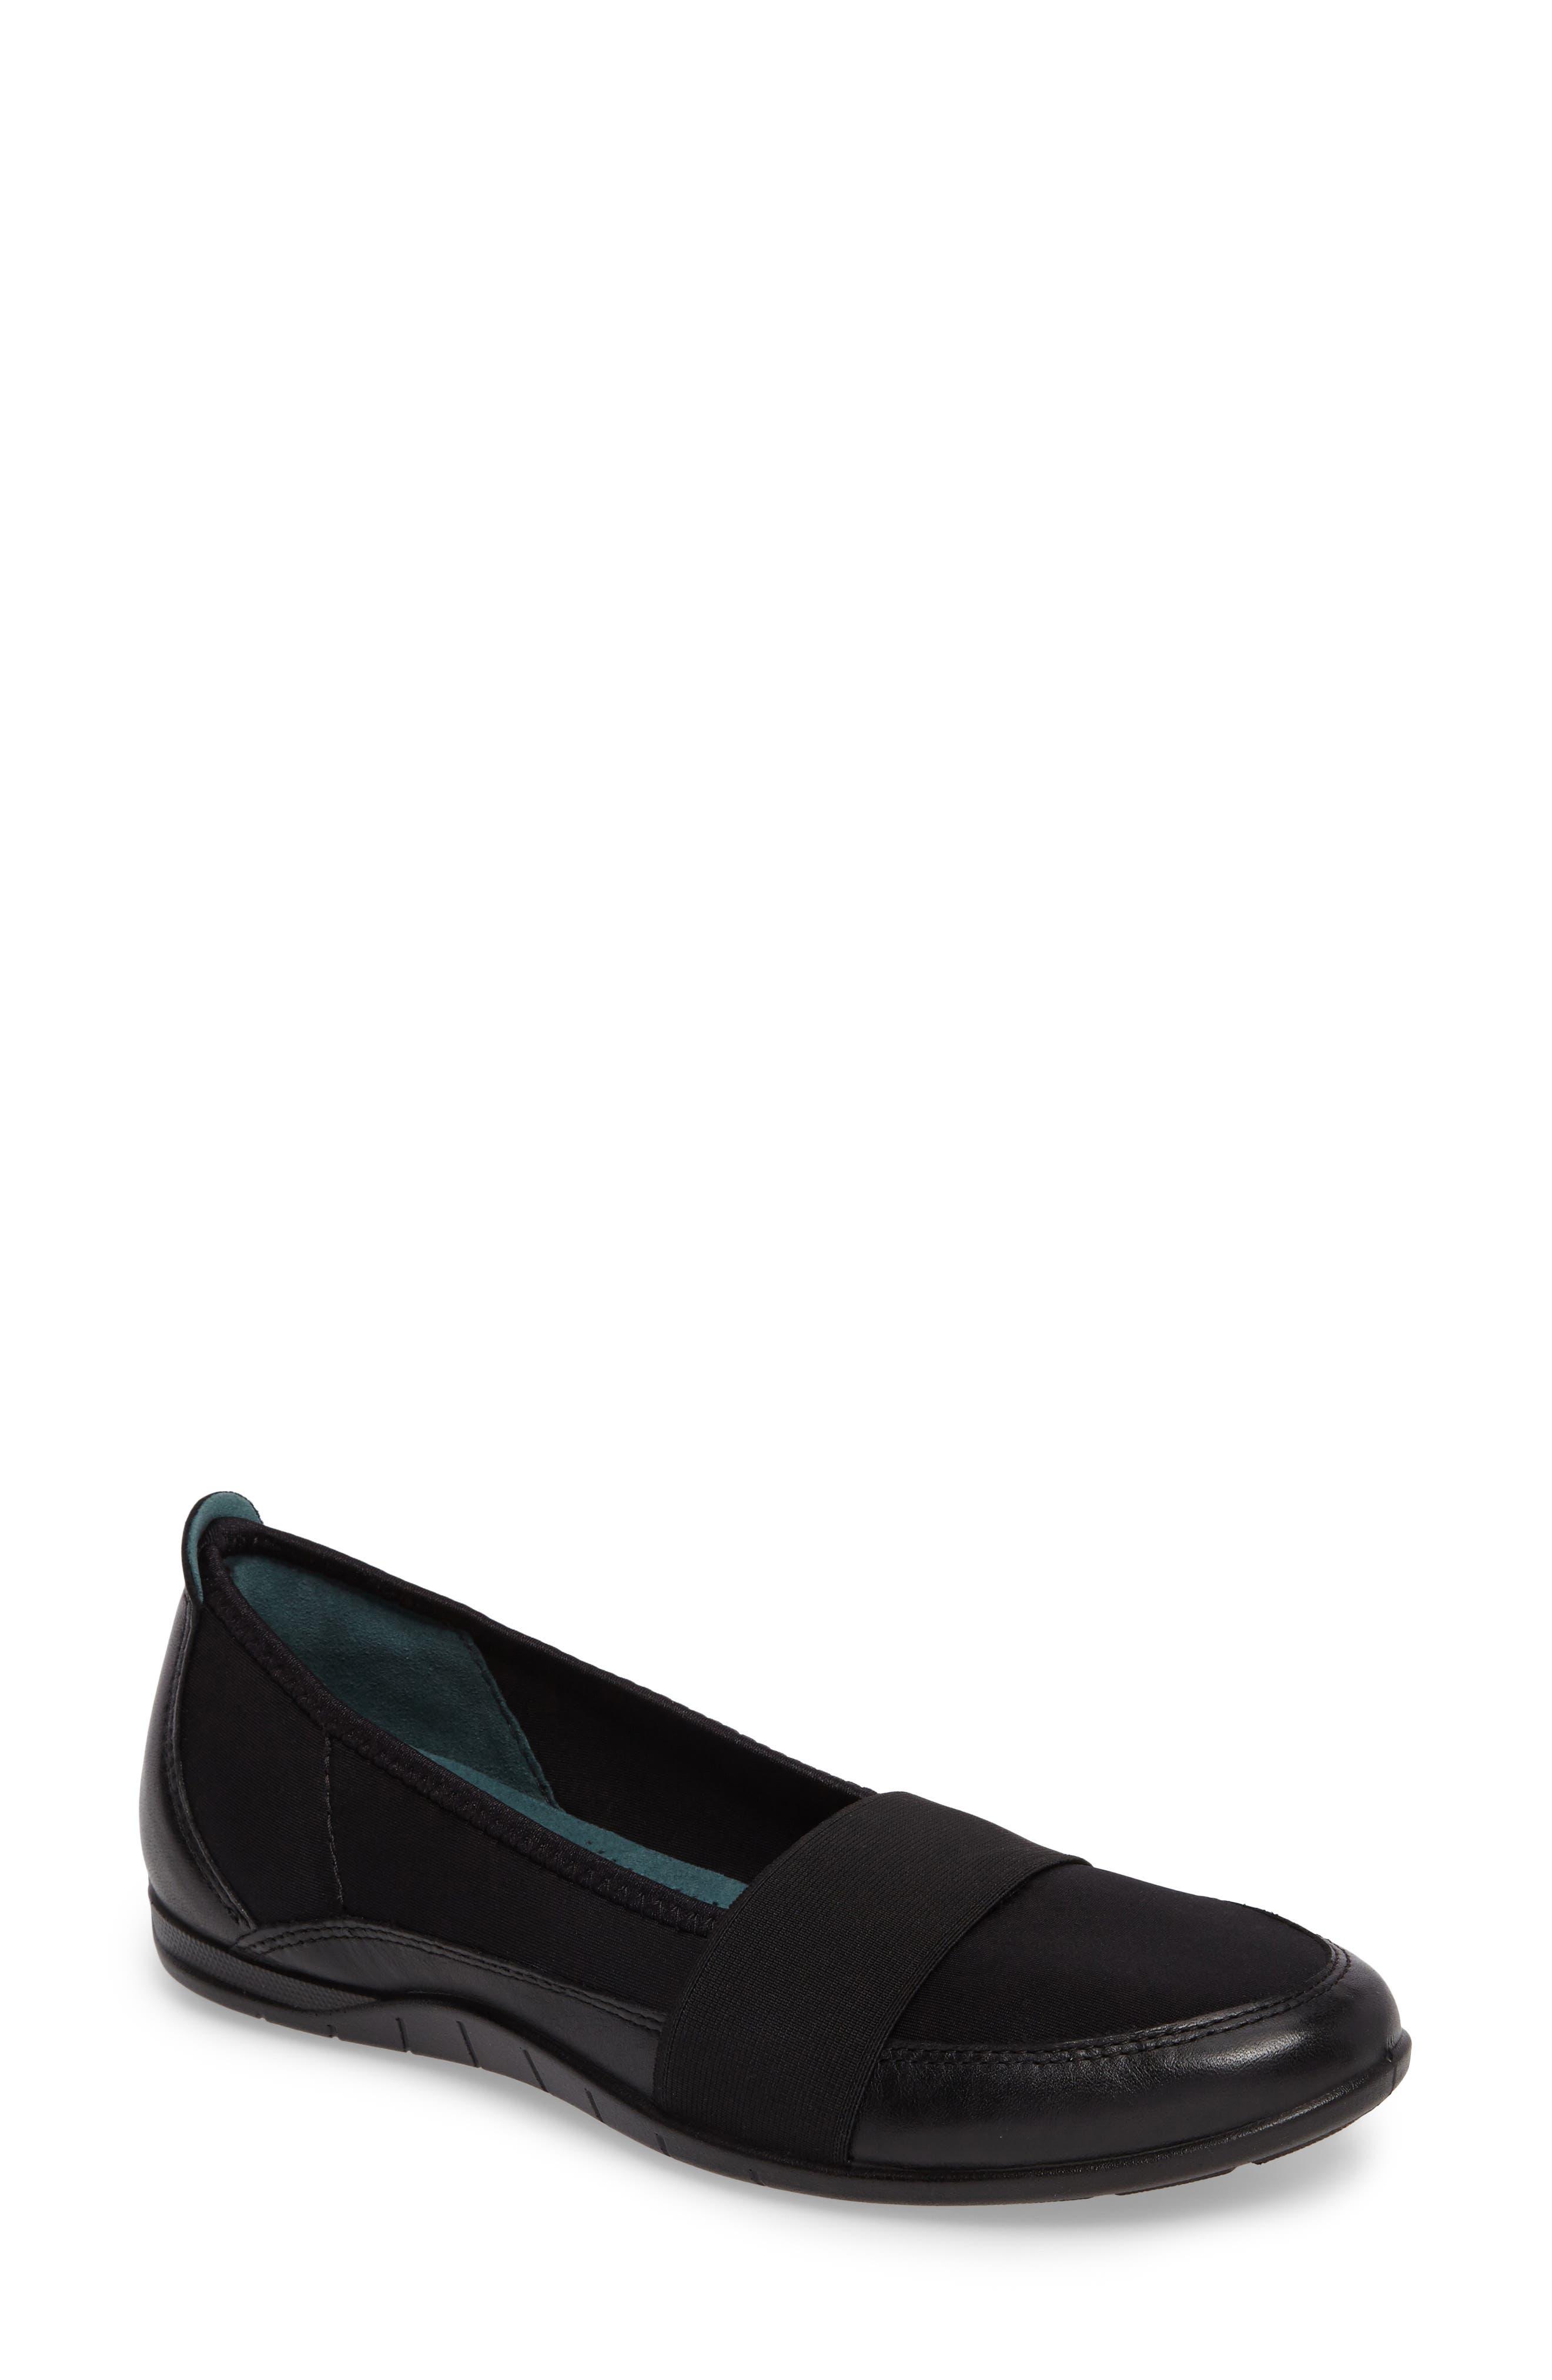 'Bluma' Slip-On Sneaker,                         Main,                         color,